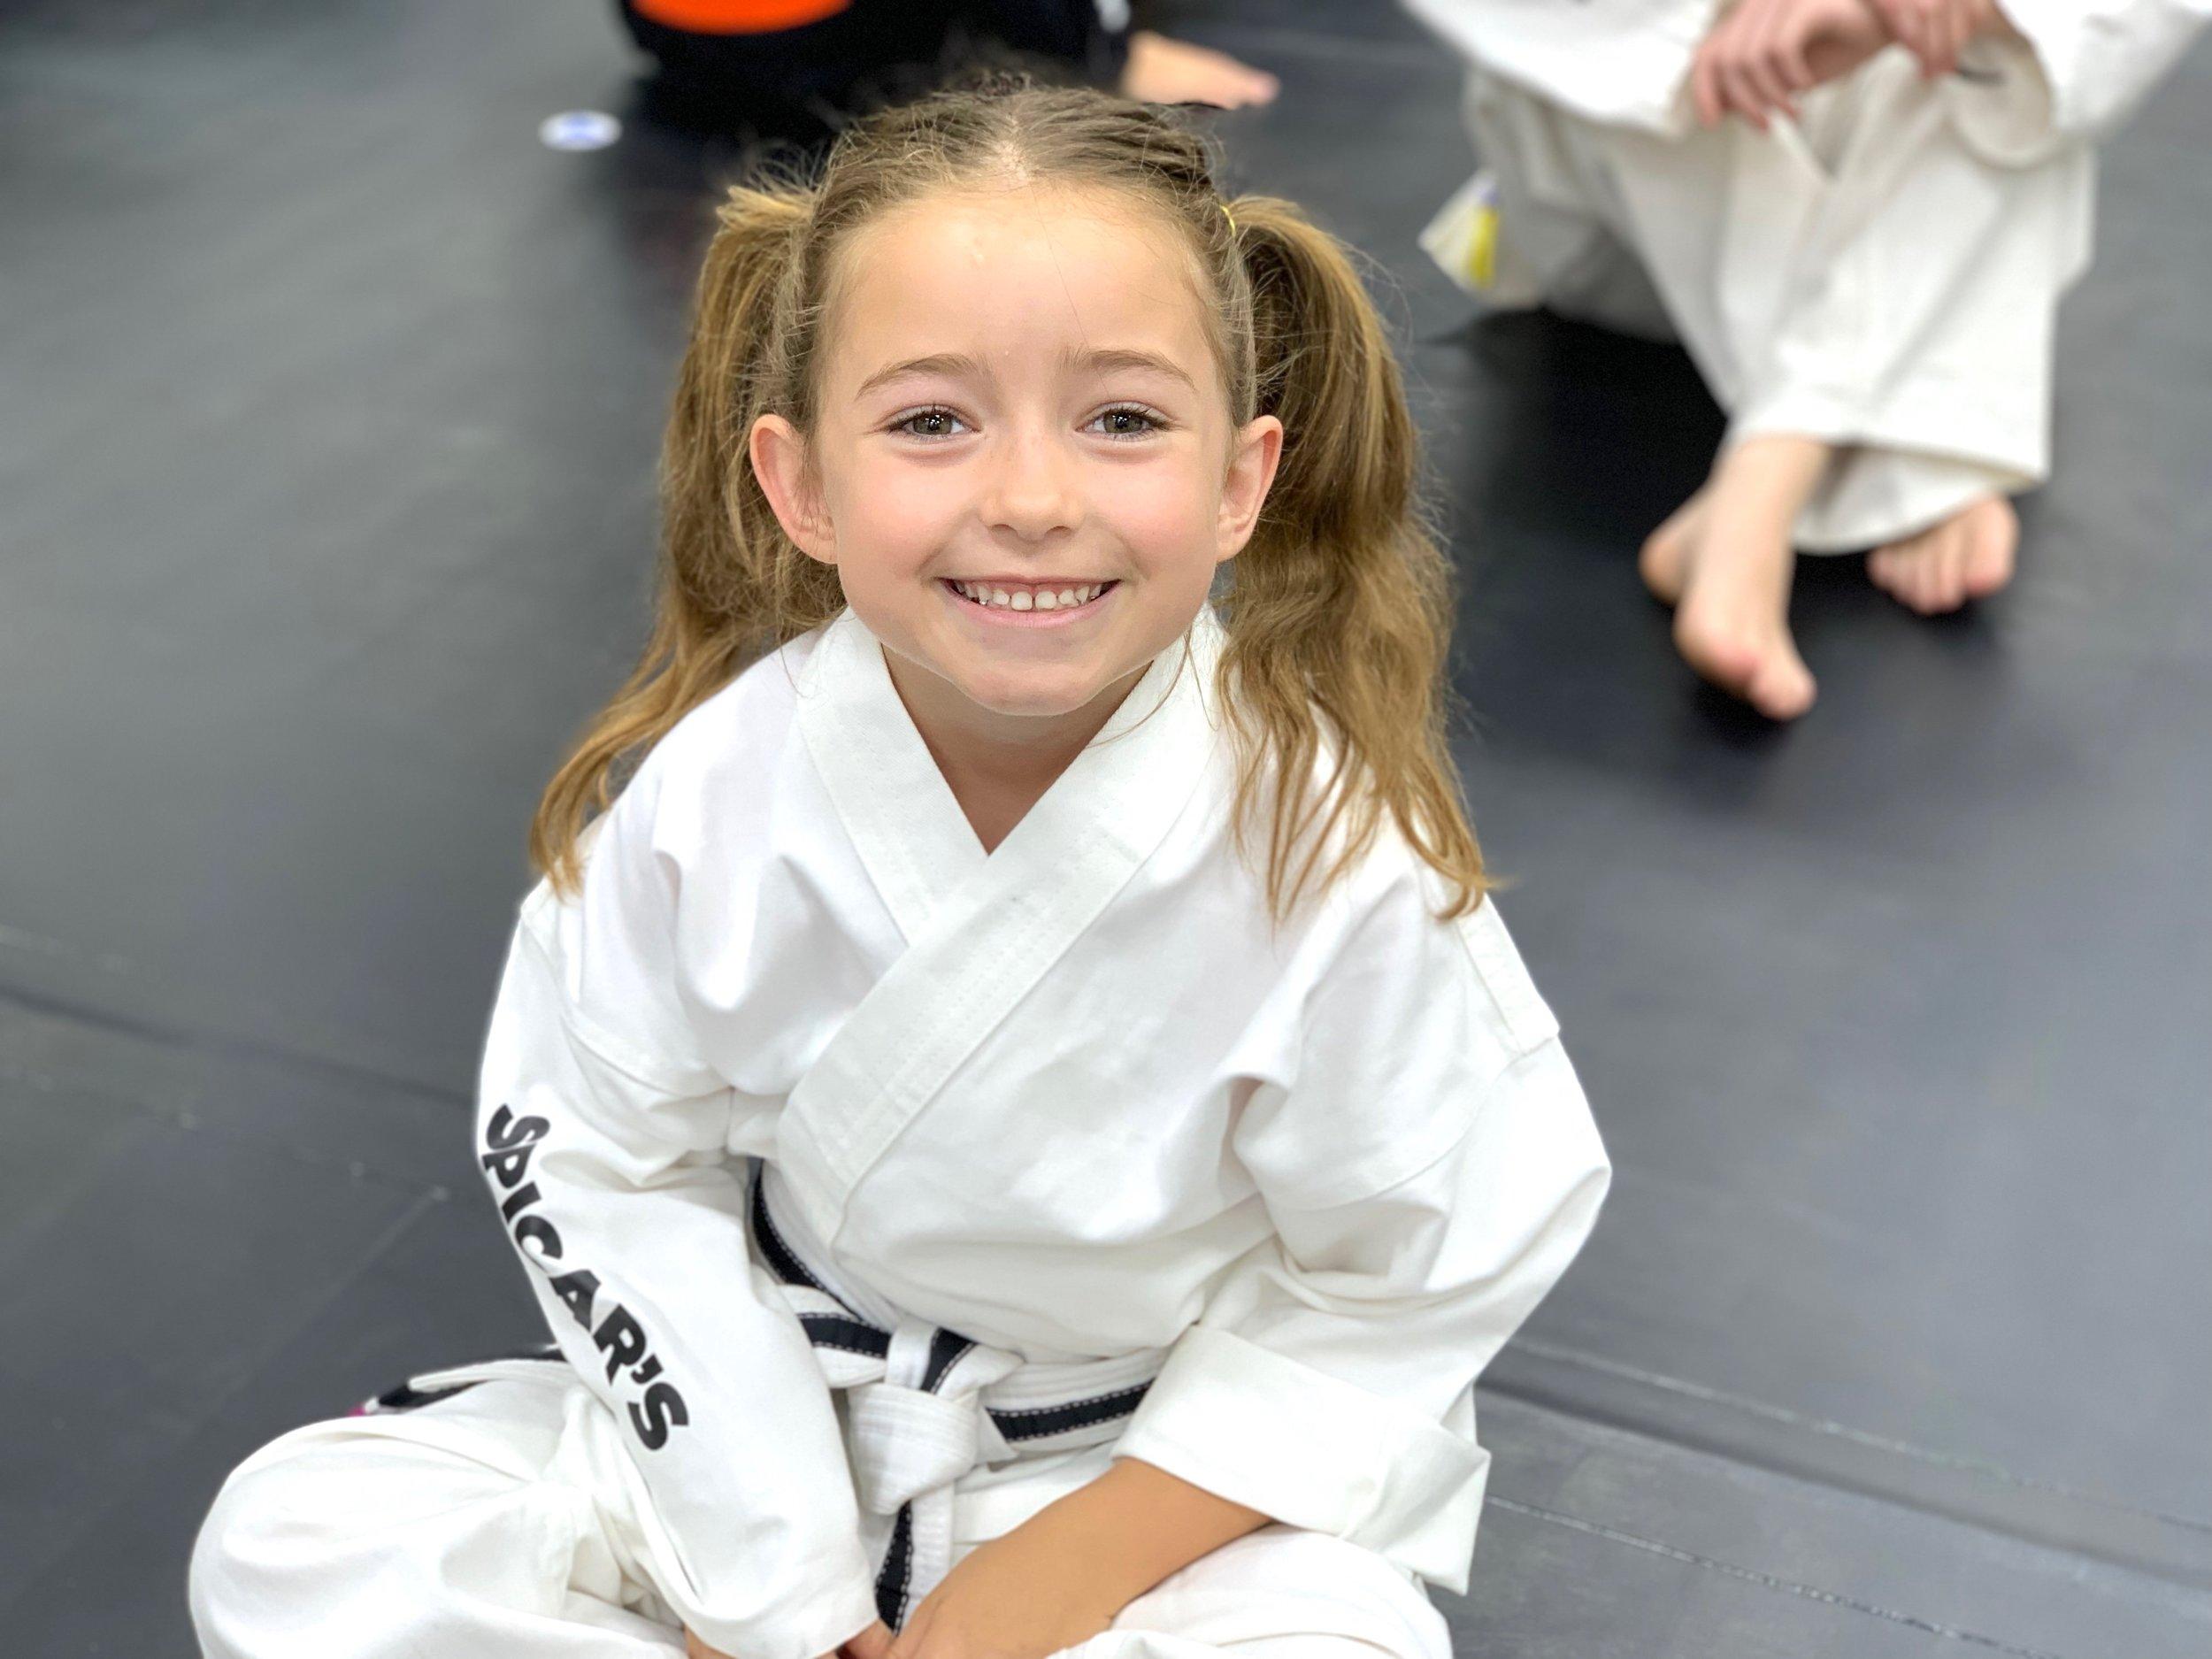 karate-kids-program-souhtlake-keller-grapevine-texas00047.jpeg